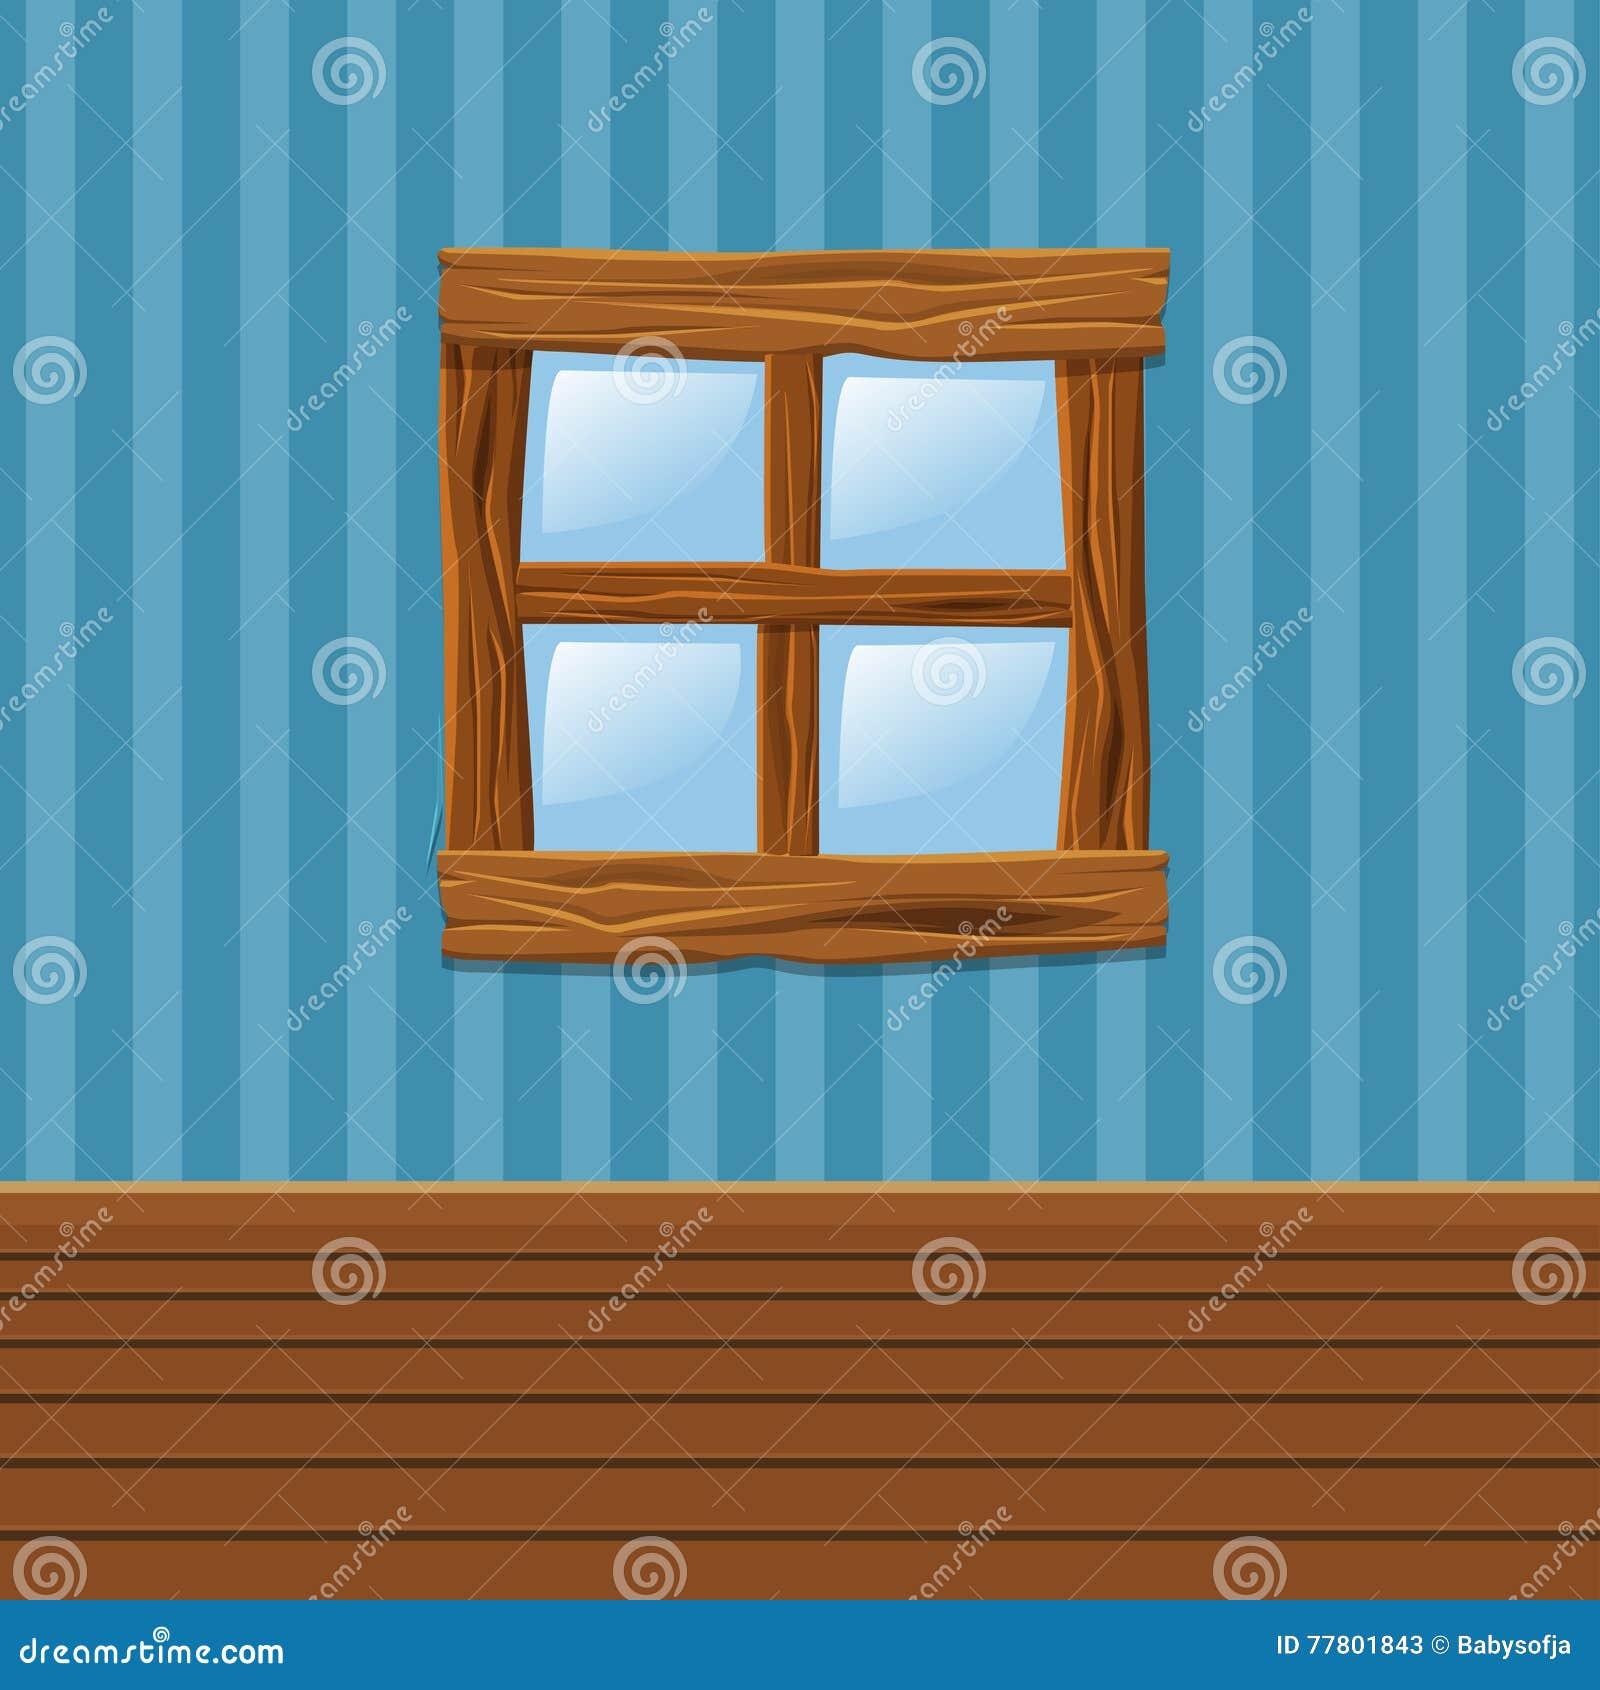 Interior wooden shelves free vector - Cartoon Wooden Old Window Home Interior